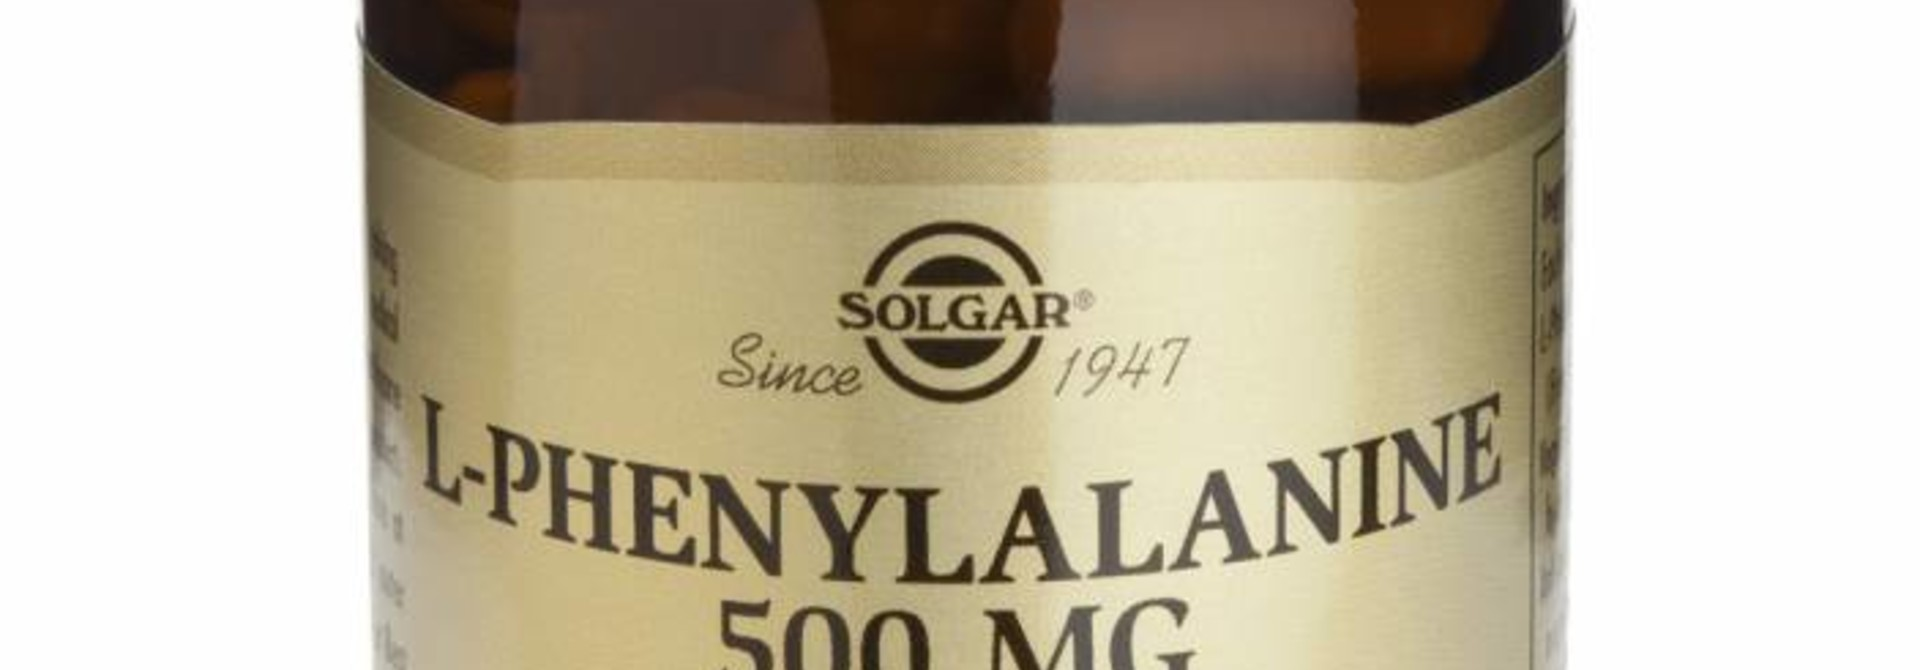 L-Phenylalanine 500 mg 50 plantaardige capsules